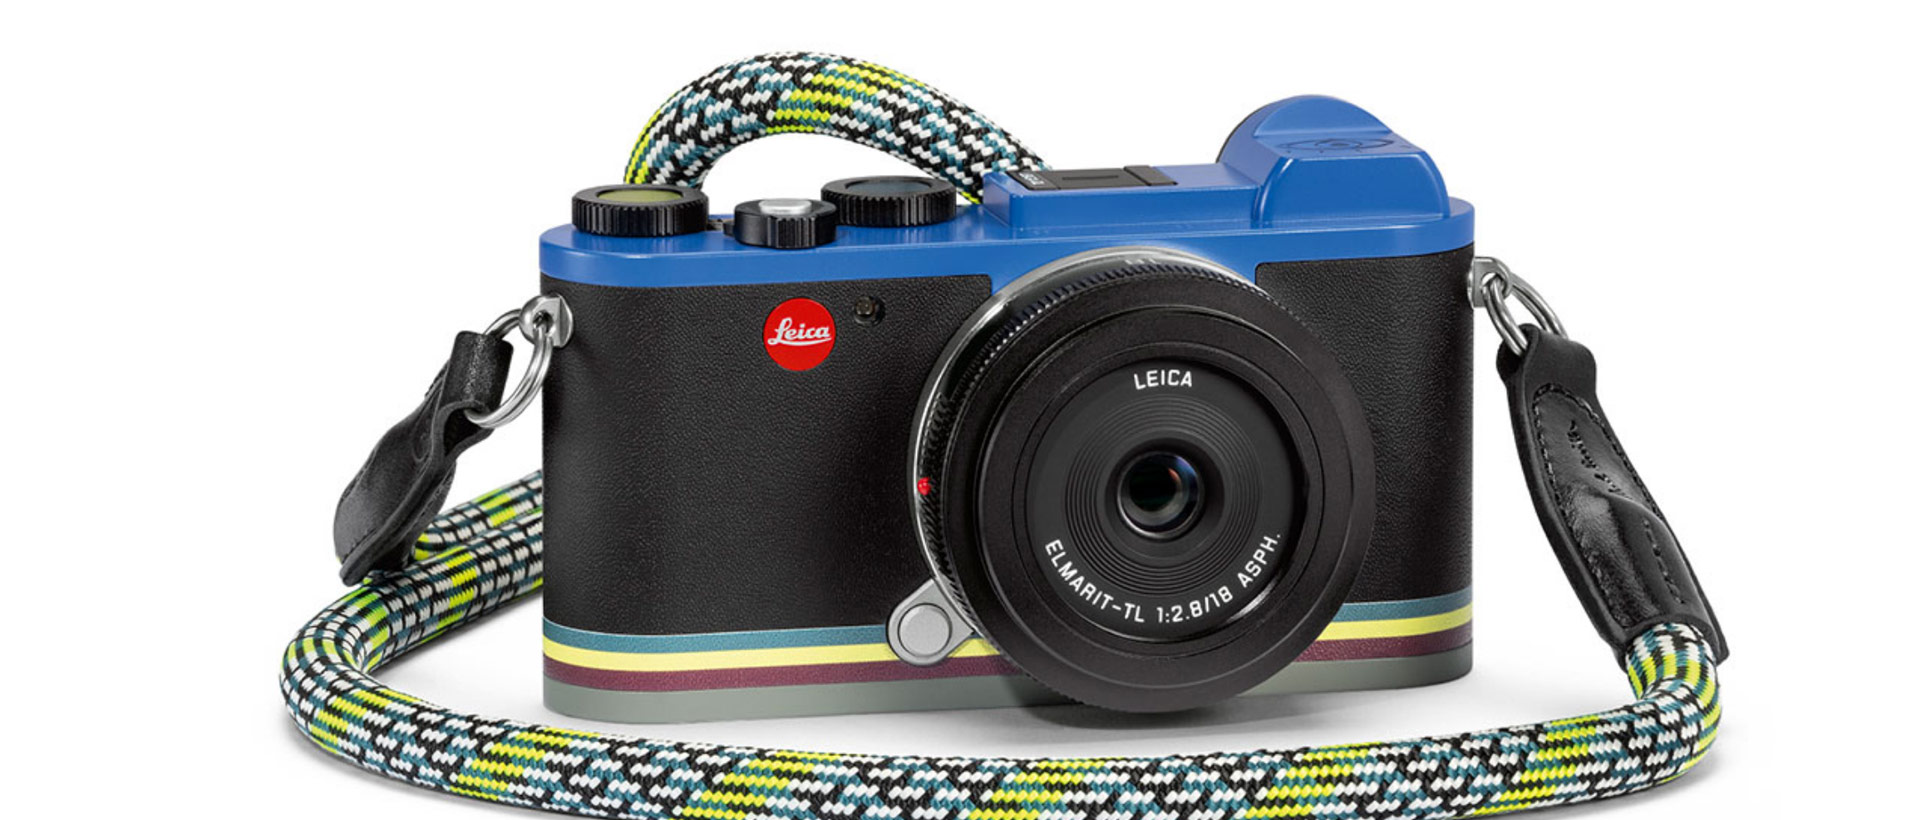 Meister Camera Leica CL